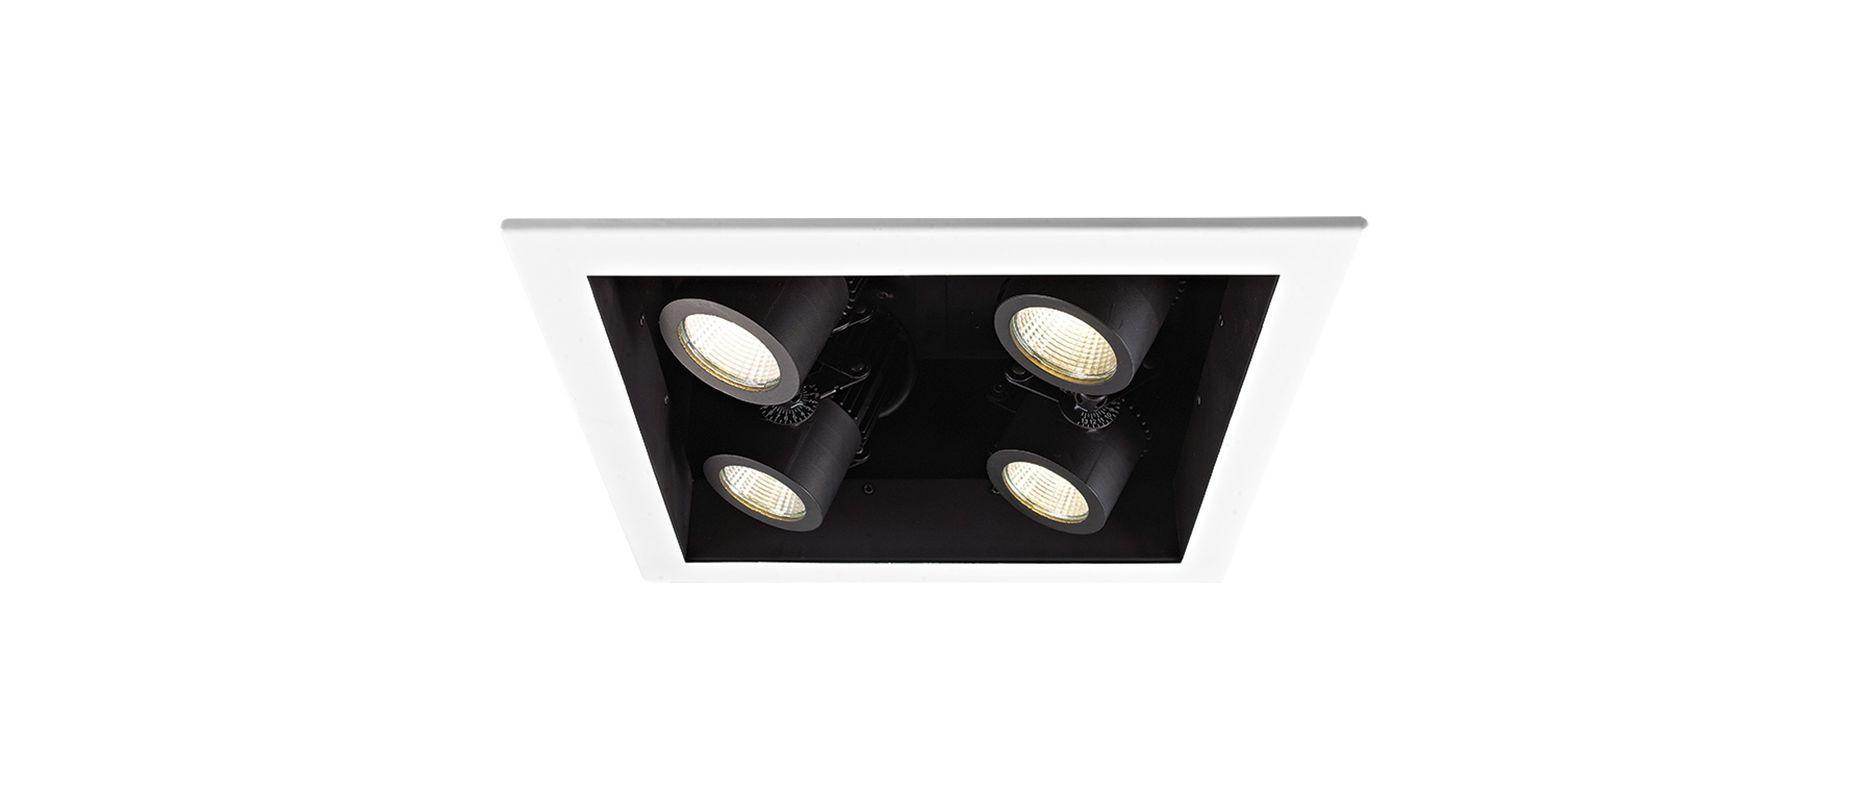 WAC Lighting MT-4LD226N-F930 4 Light Energy Star 3000K High Output LED